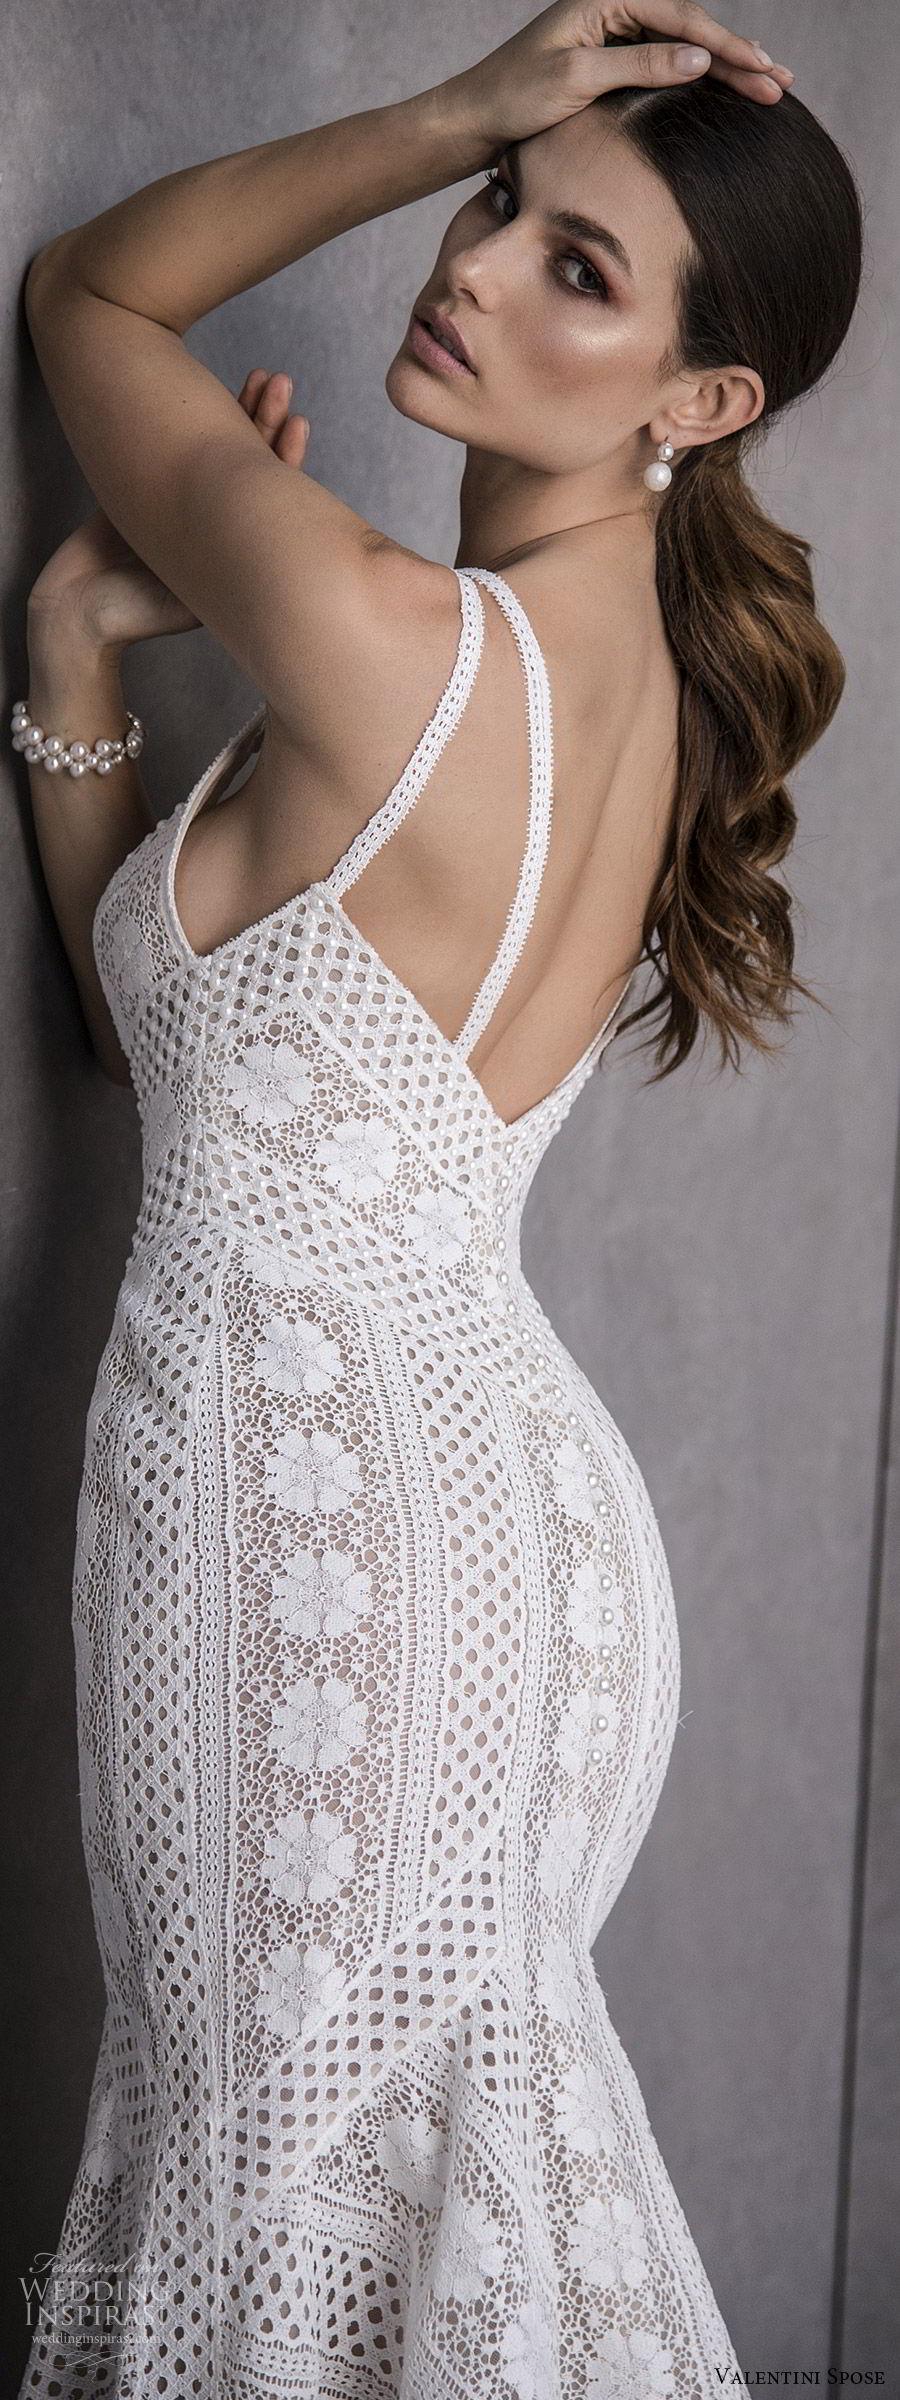 valentini spose spring 2020 bridal sleeveless double straps v neckline lace fit flare mermaid sheath wedding dress (14) boho chic romantic bv